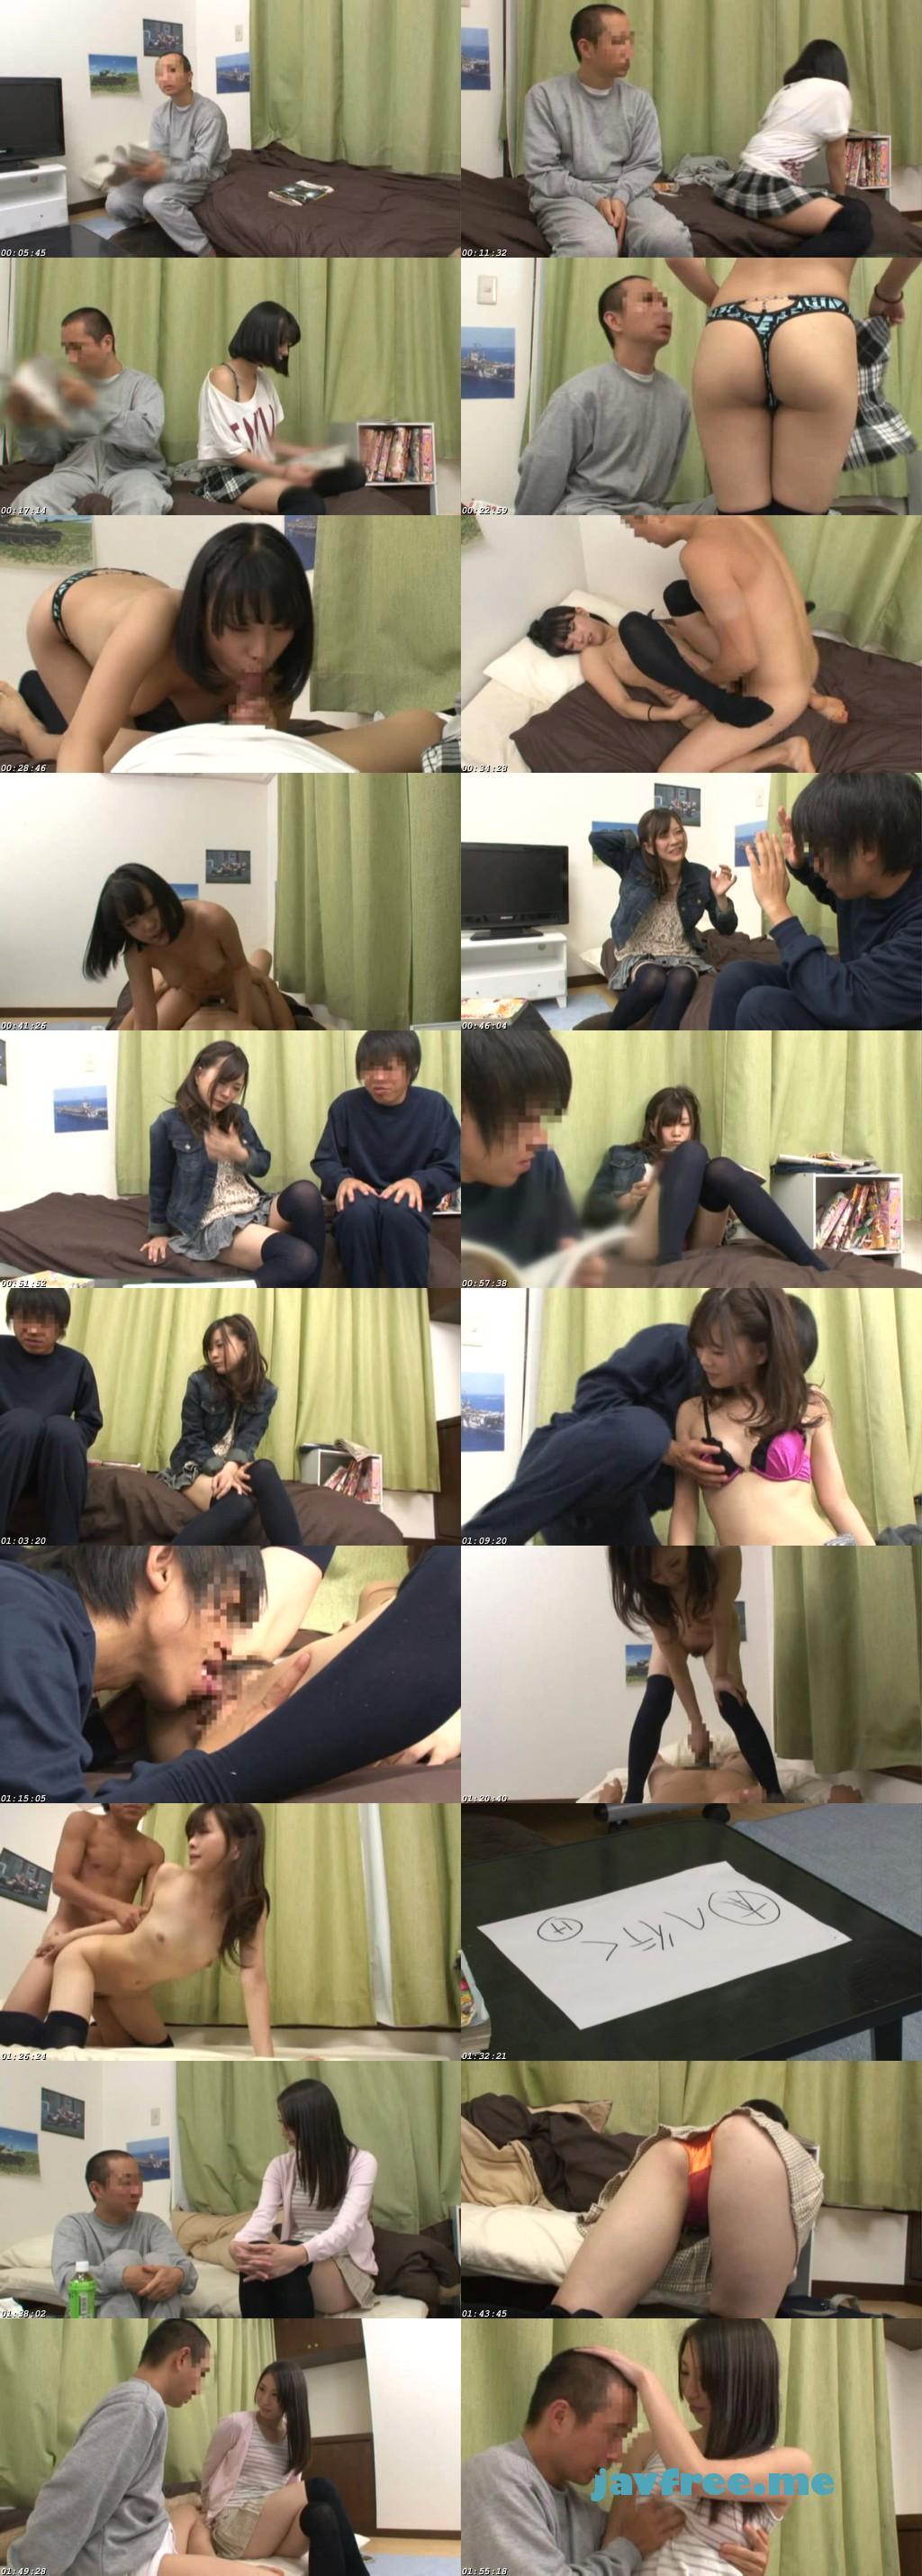 [HUNT 674] ショック! ○い頃超キレイで真面目だった親戚のお姉ちゃんがヤリマンに!?東京の大学に行ってすっかりヤリマンになってしまった親戚のお姉ちゃんが親族の集まりで我が家にやってきて久しぶりに再会!! HUNT